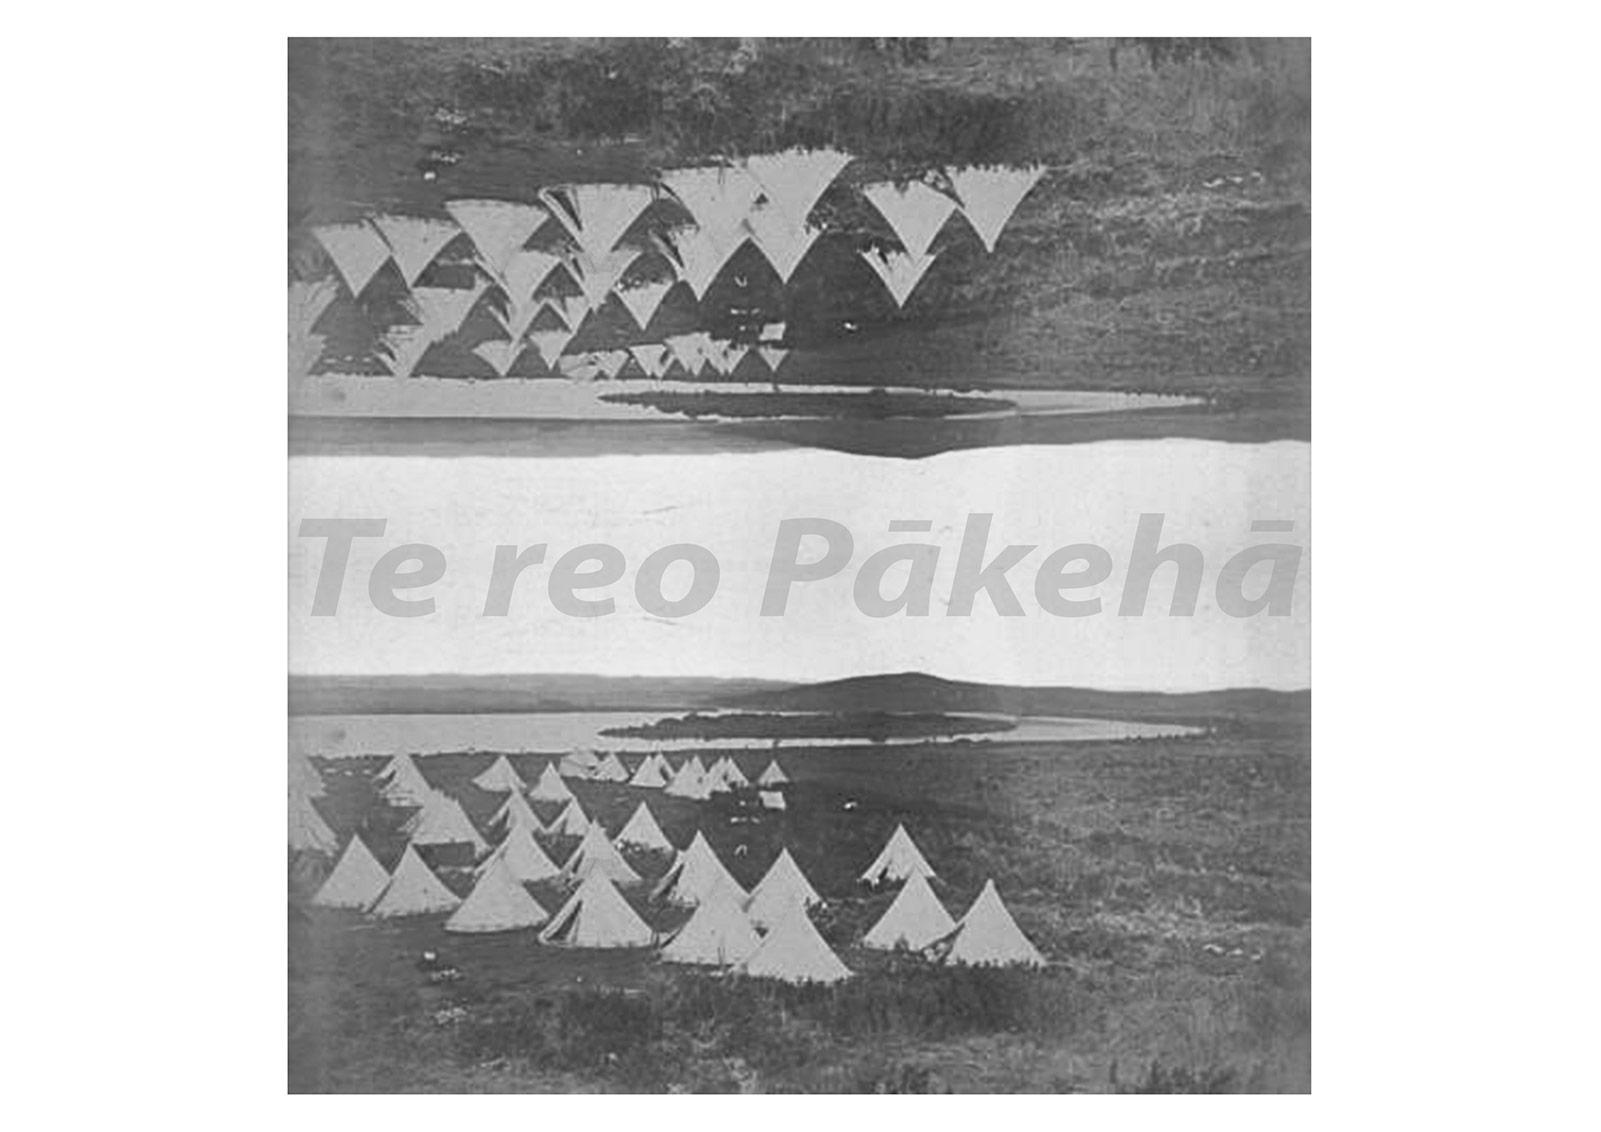 TeReoPaakehaa1600.jpg